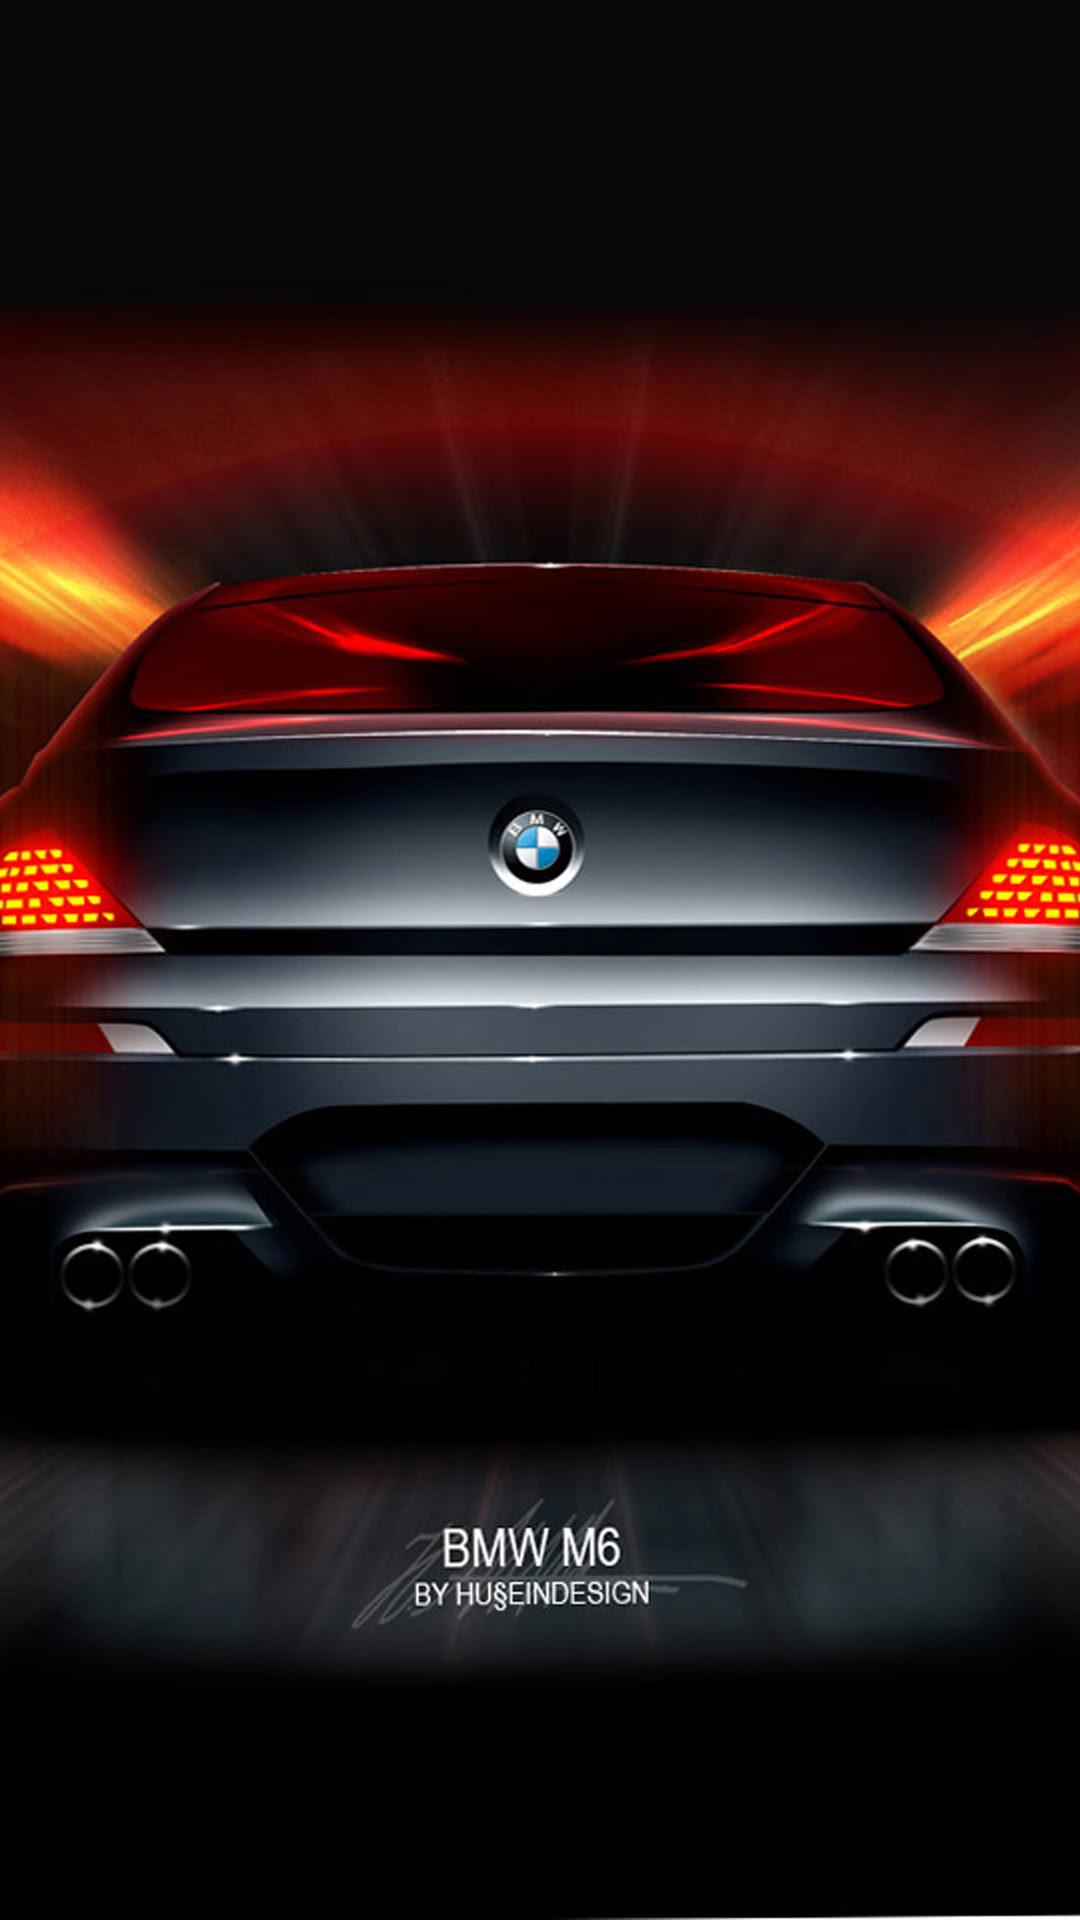 BMW M6 HD Wallpaper iPhone 6 plus  wallpapersmobile.net